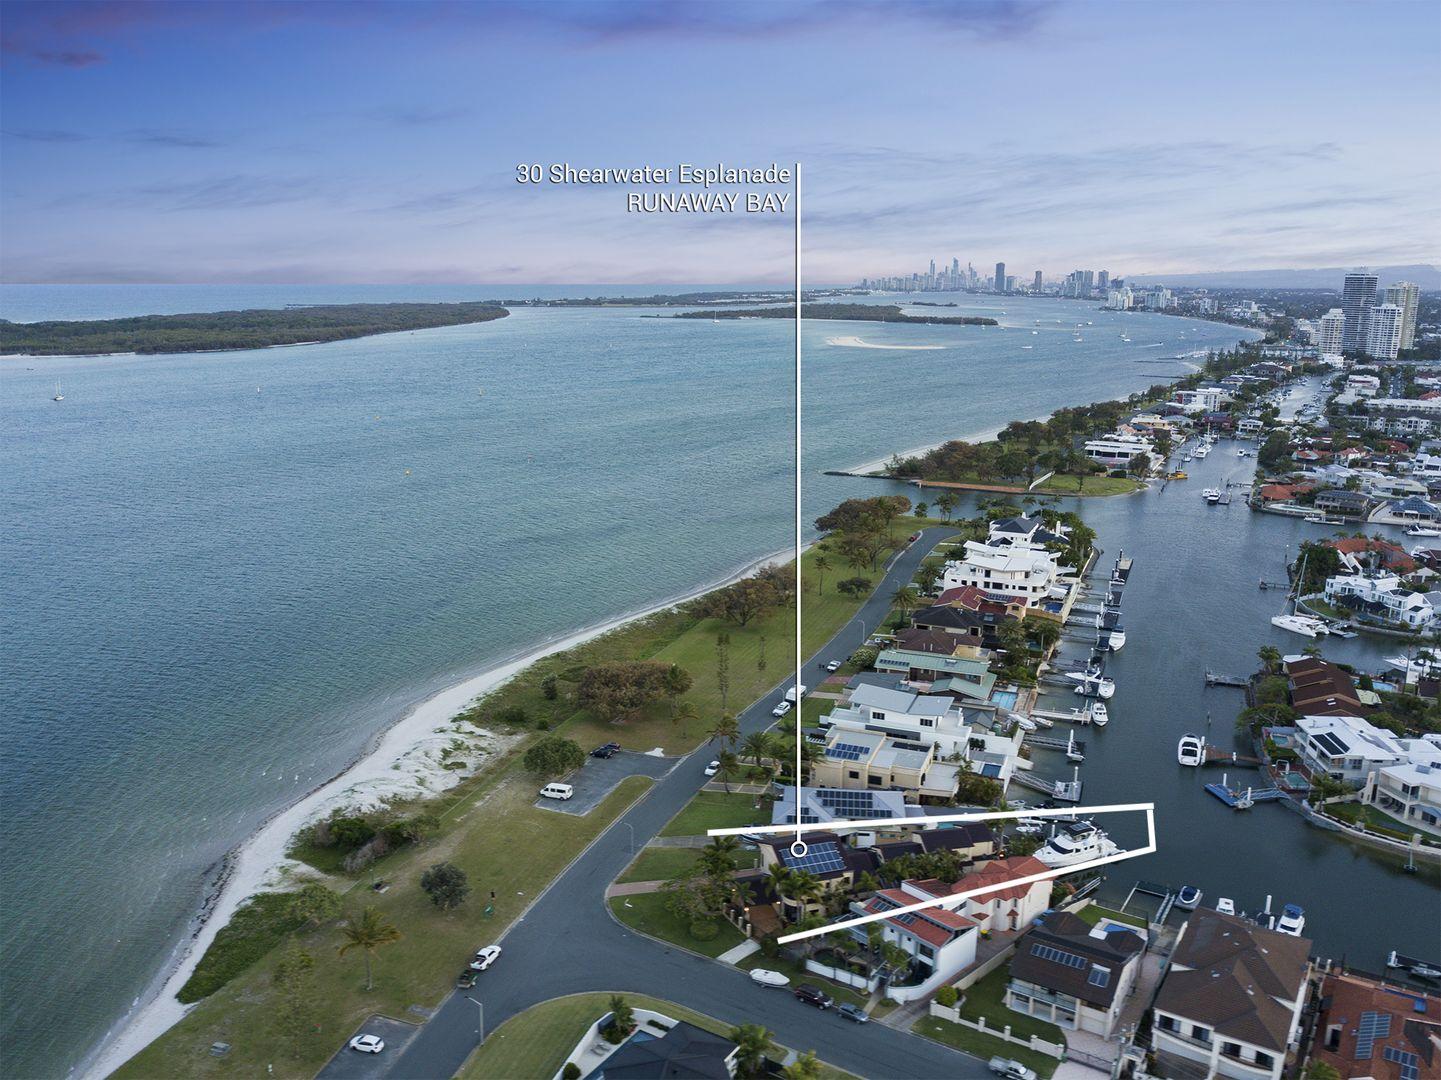 30 Shearwater Esplanade, Runaway Bay QLD 4216, Image 0